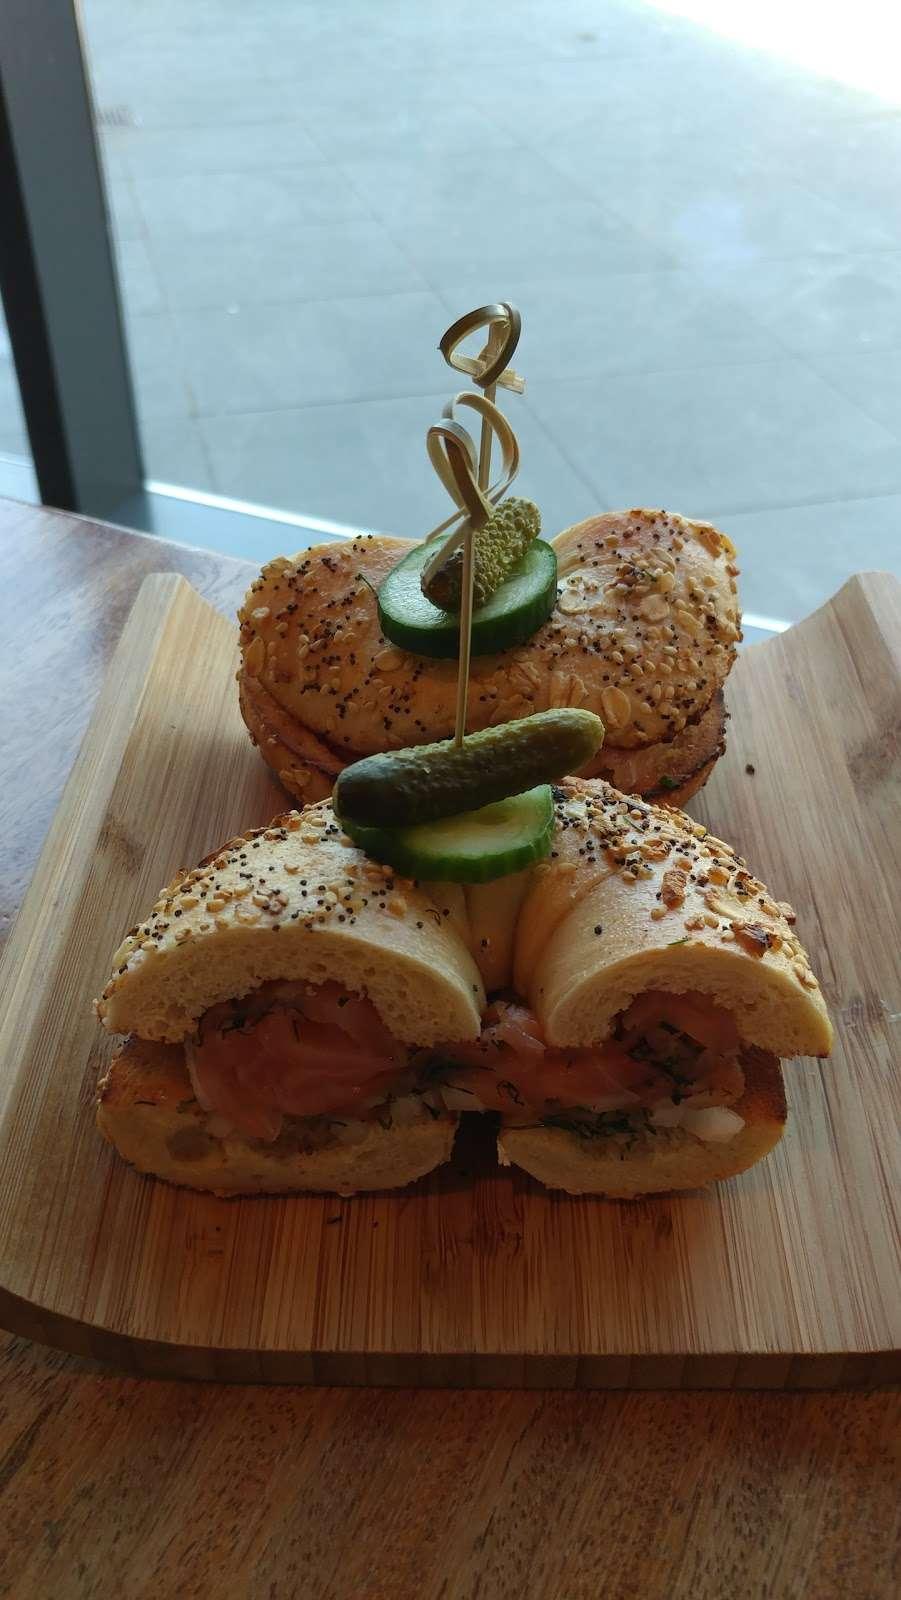 Lox Cafe - restaurant  | Photo 6 of 10 | Address: 2, 36 Battery Pl, New York, NY 10280, USA | Phone: (646) 437-4231